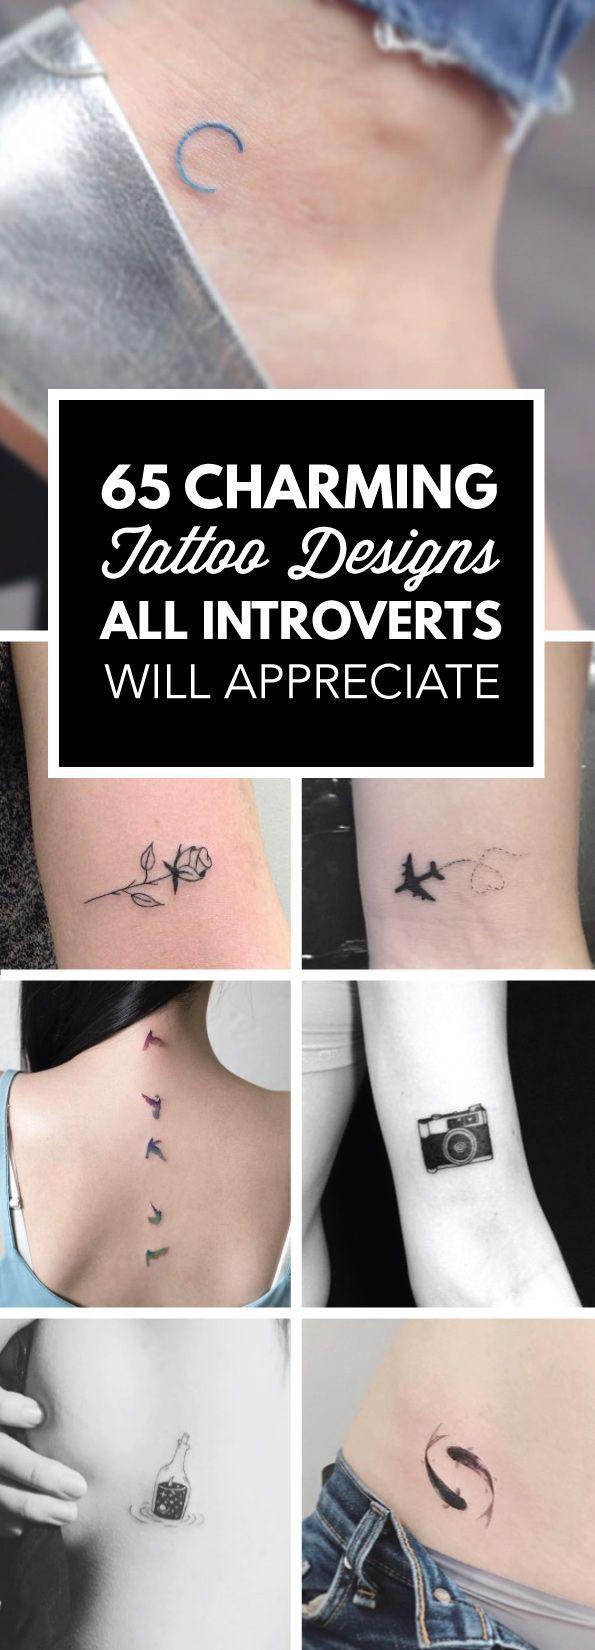 65 Charming Tattoo Designs All Introverts Will Appreciate: